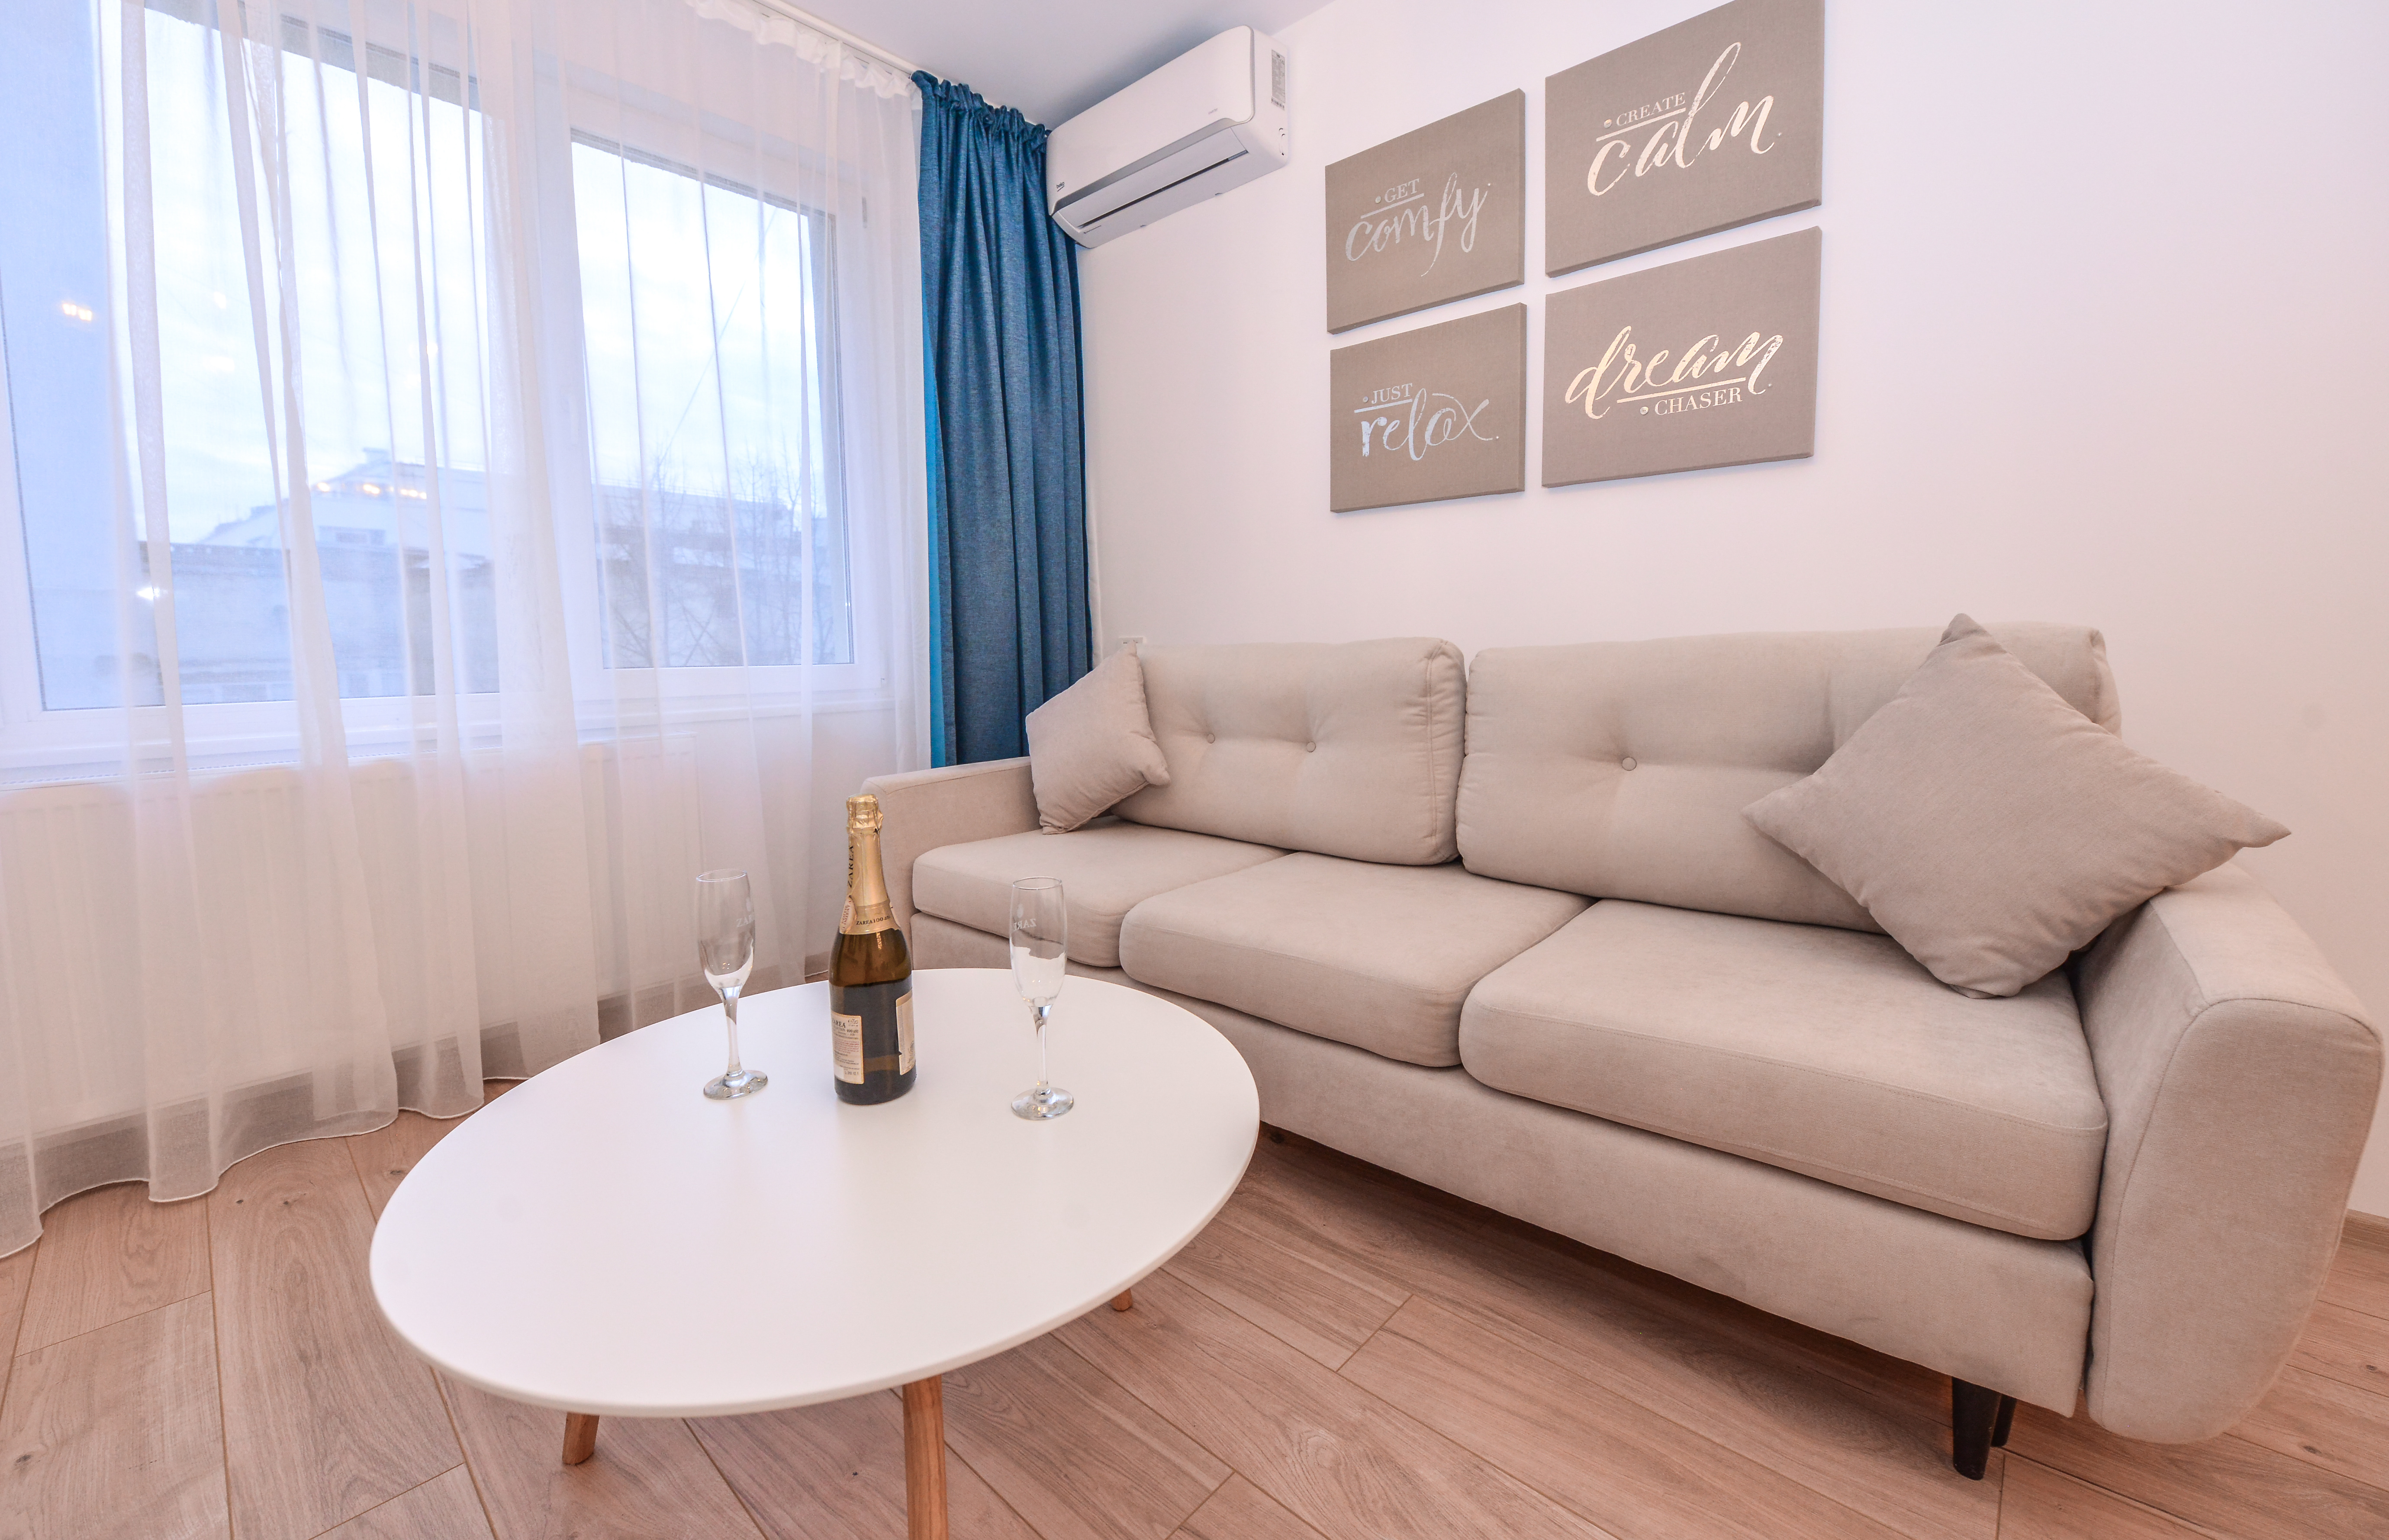 Marina Apartment - Cismigiu Garten